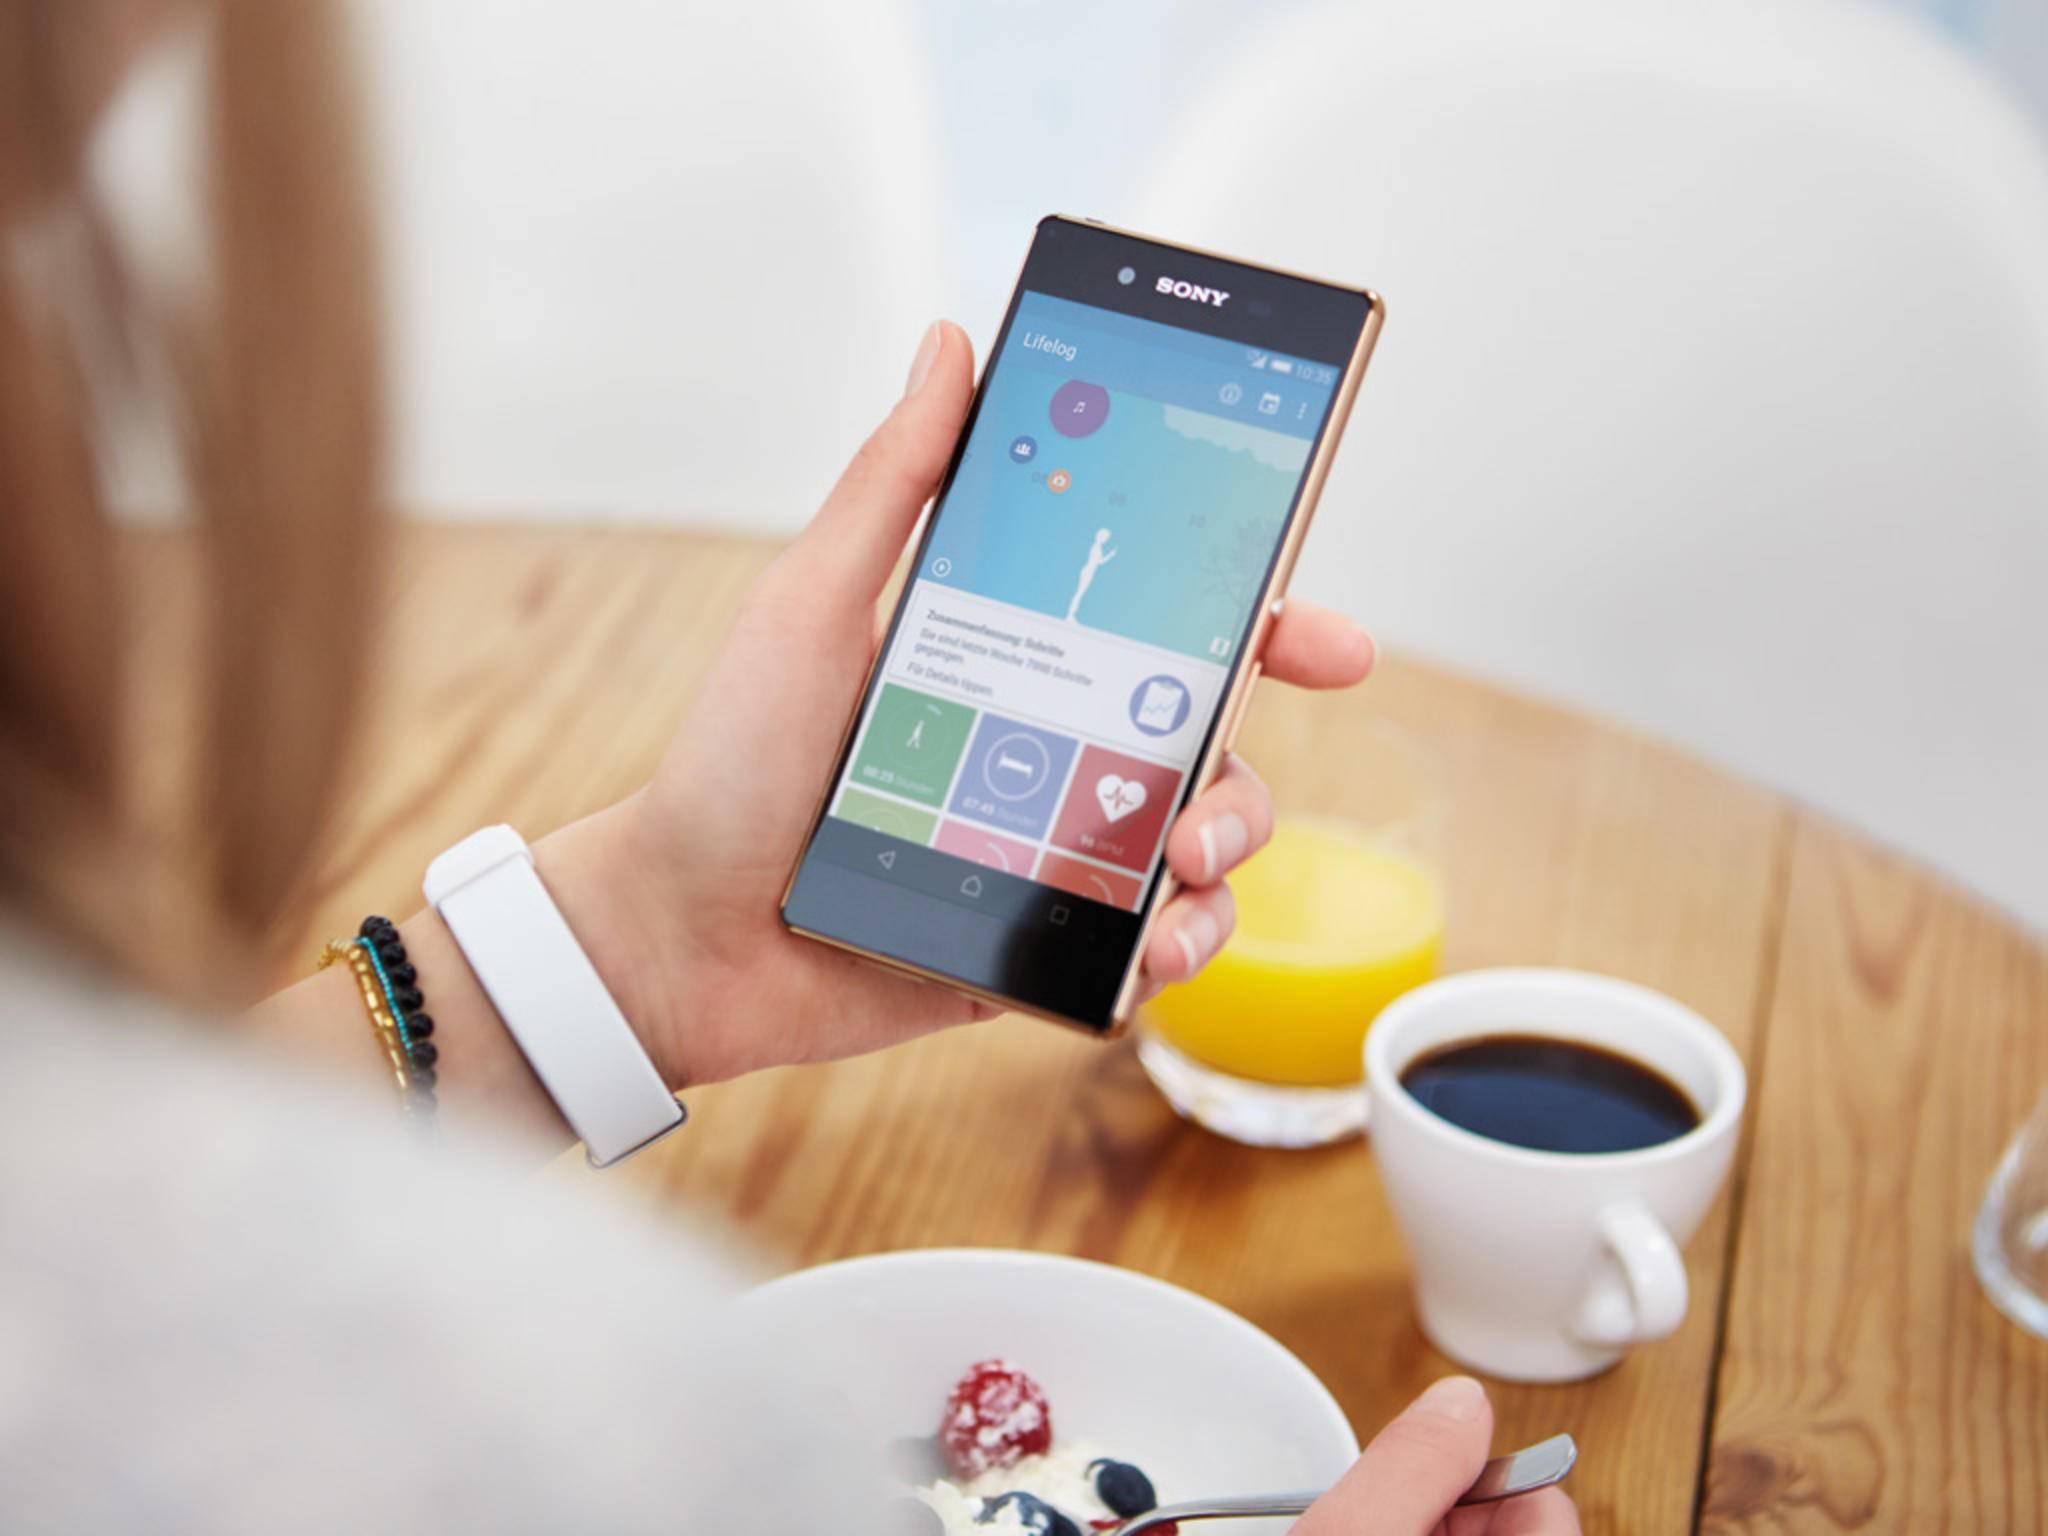 Die Android-App Lifelog ist ein digitales Tagebuch.